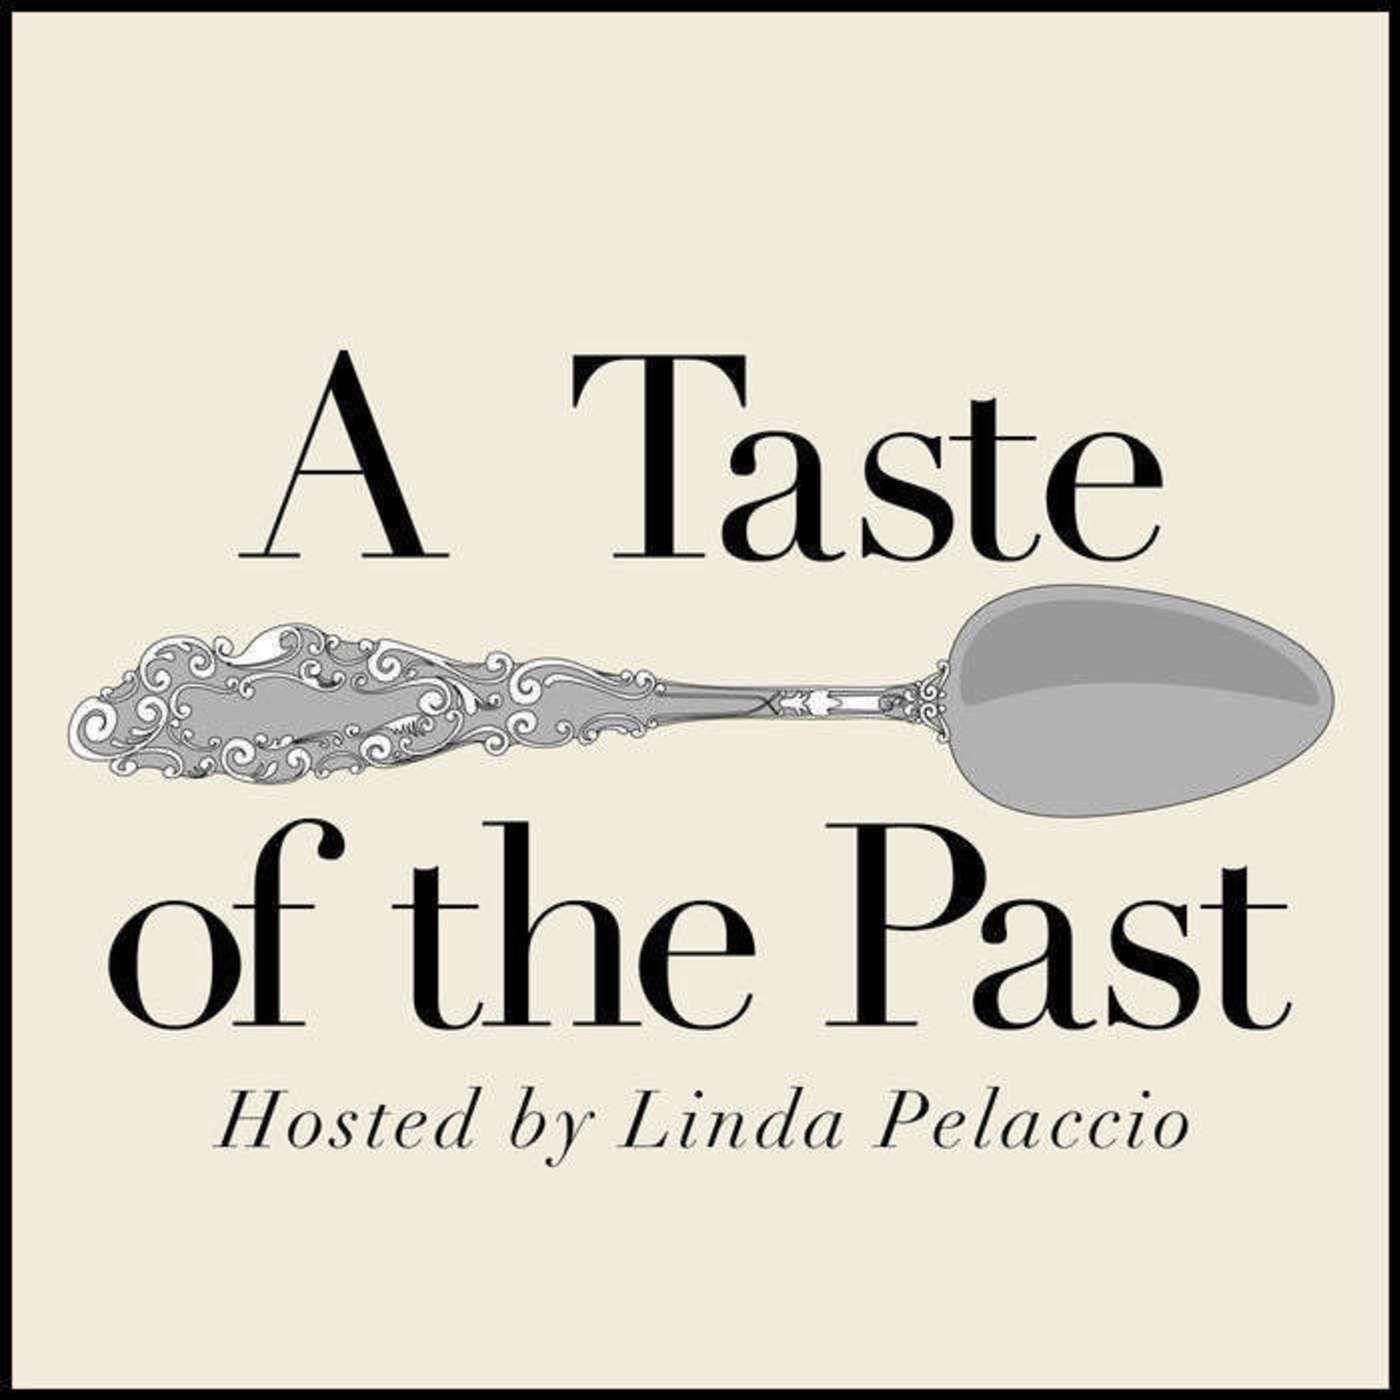 Episode 5: Jewish Delicatessens with David Sax